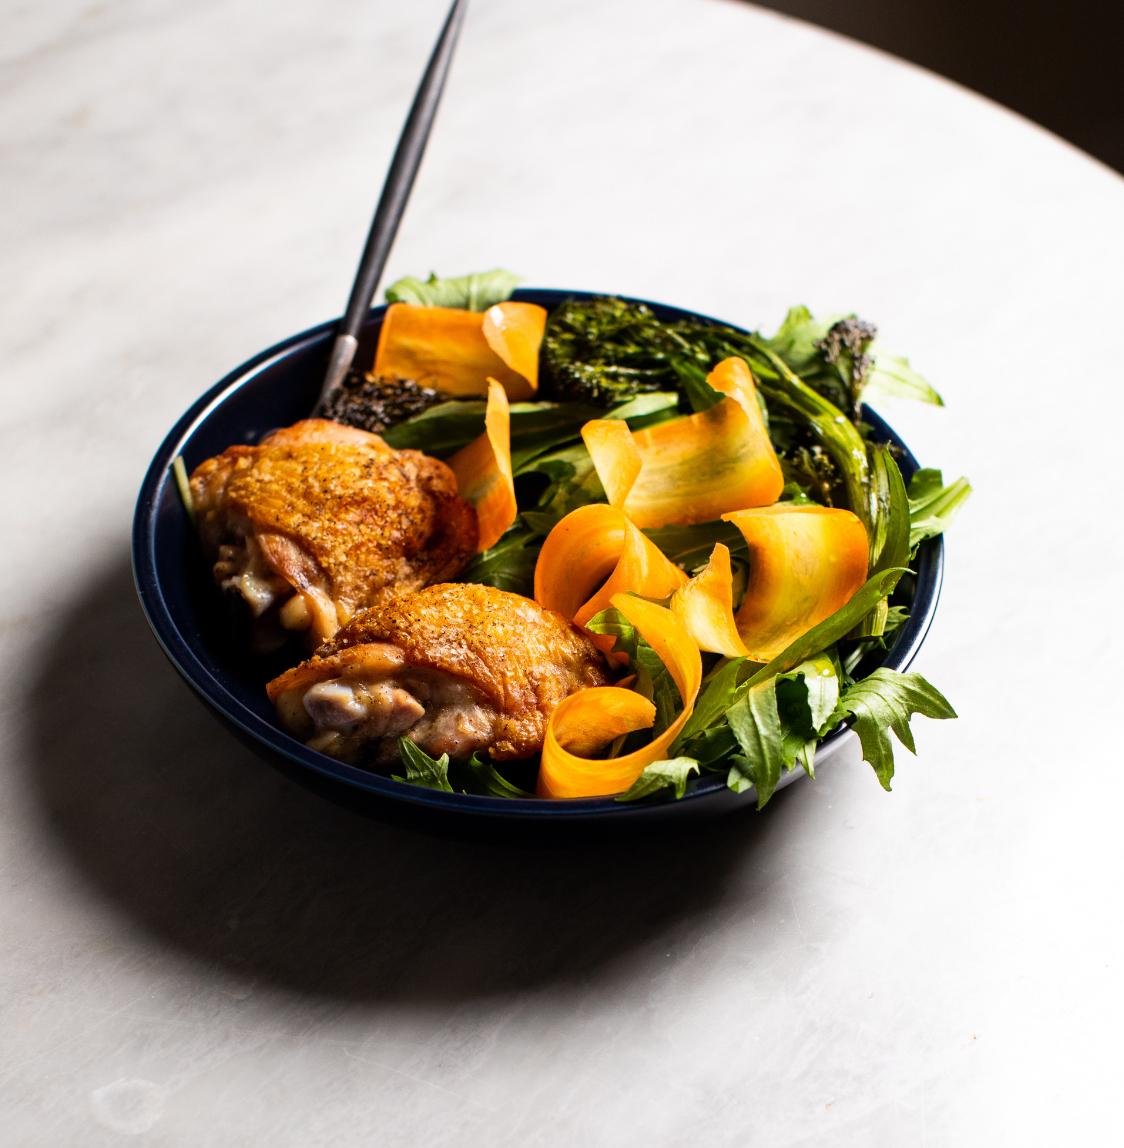 Mizuna Salad with Roasted Chicken